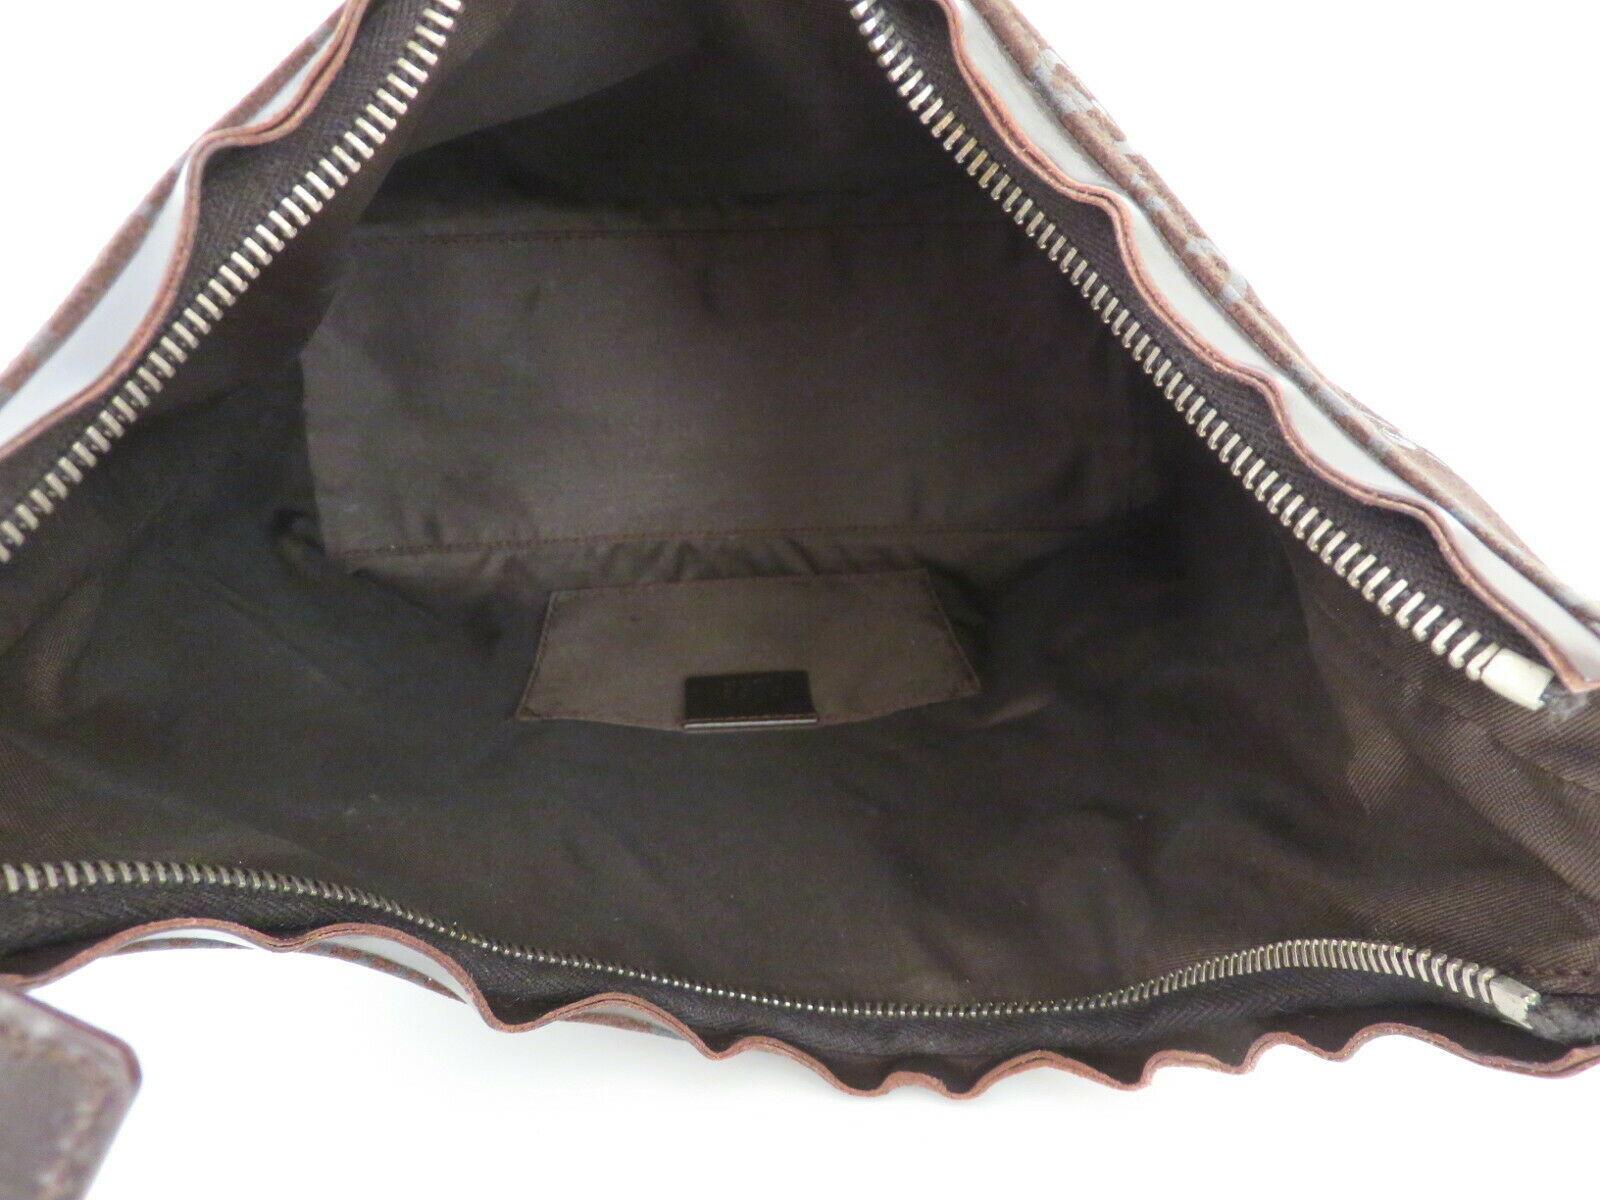 Authentic GUCCI Dark Brown Original GG Suede Leather Shoulder Bag Purse